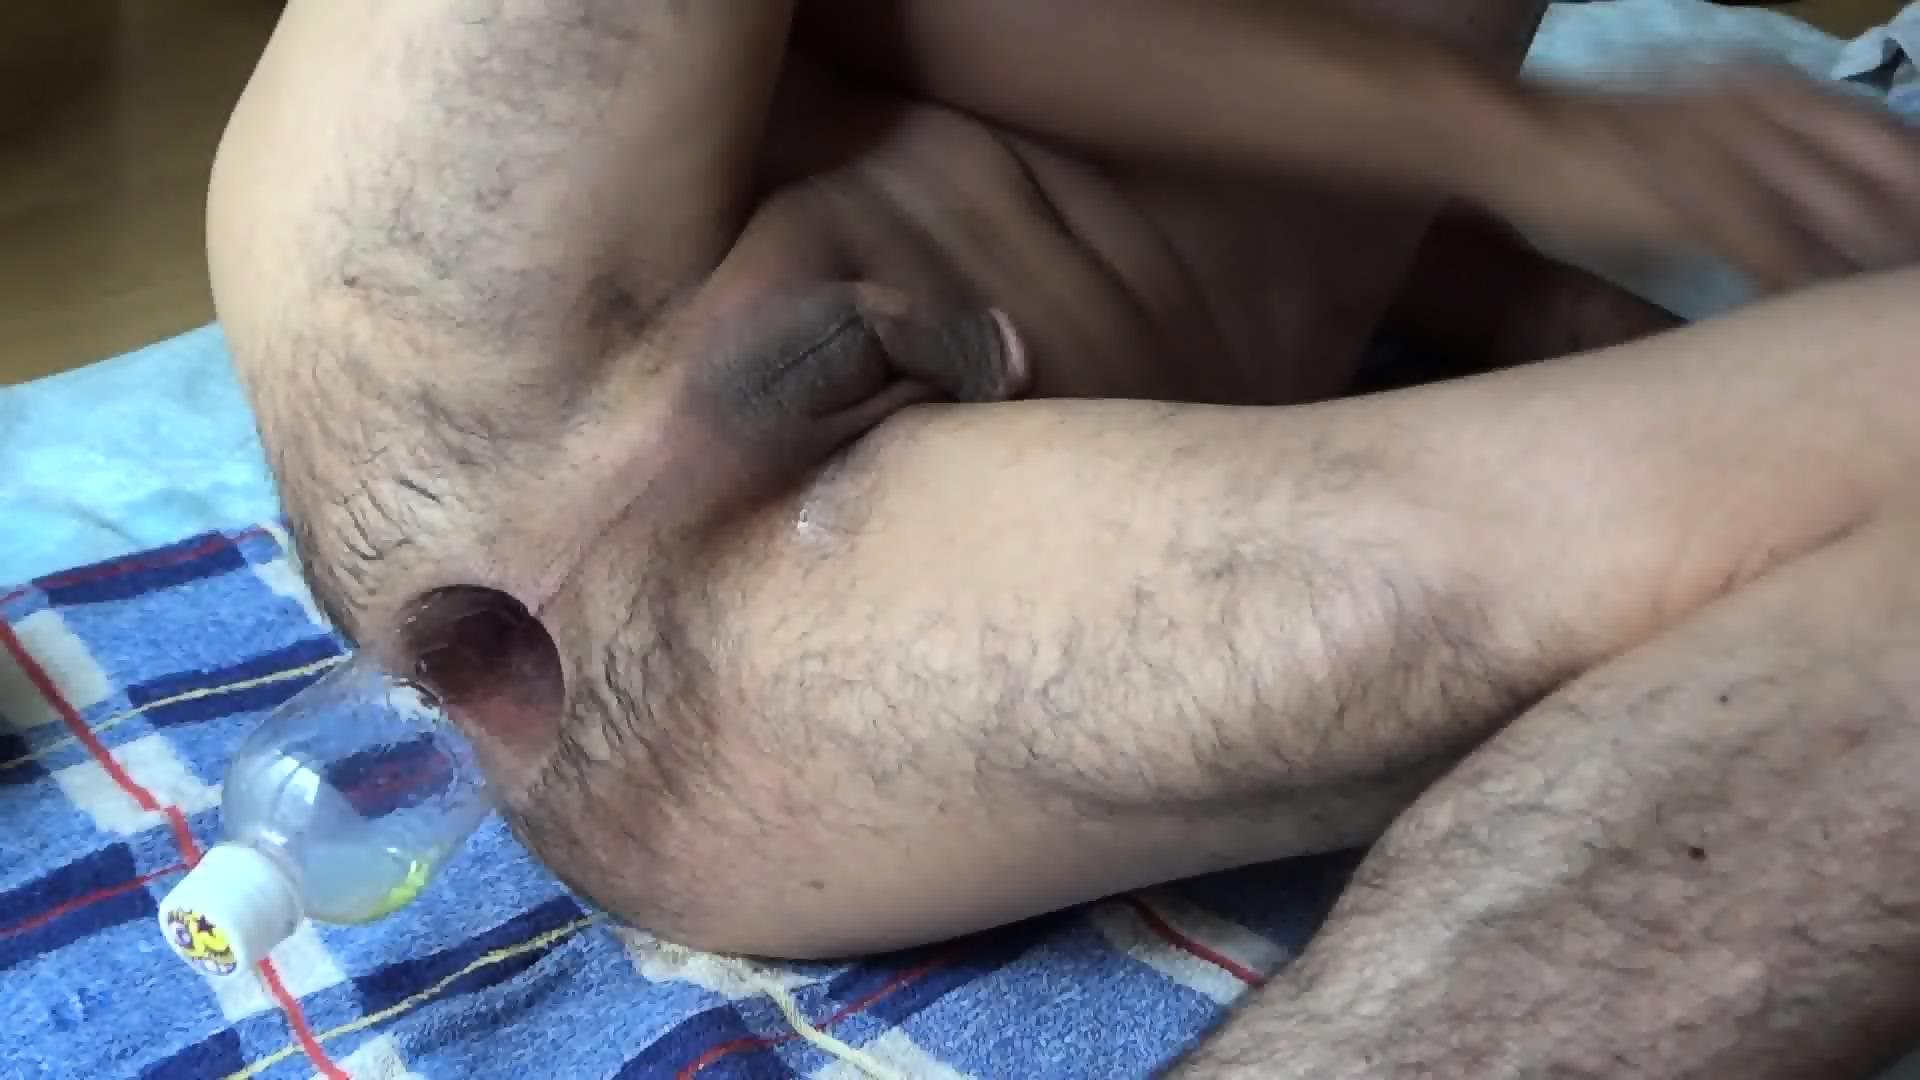 Bick Dick Porno